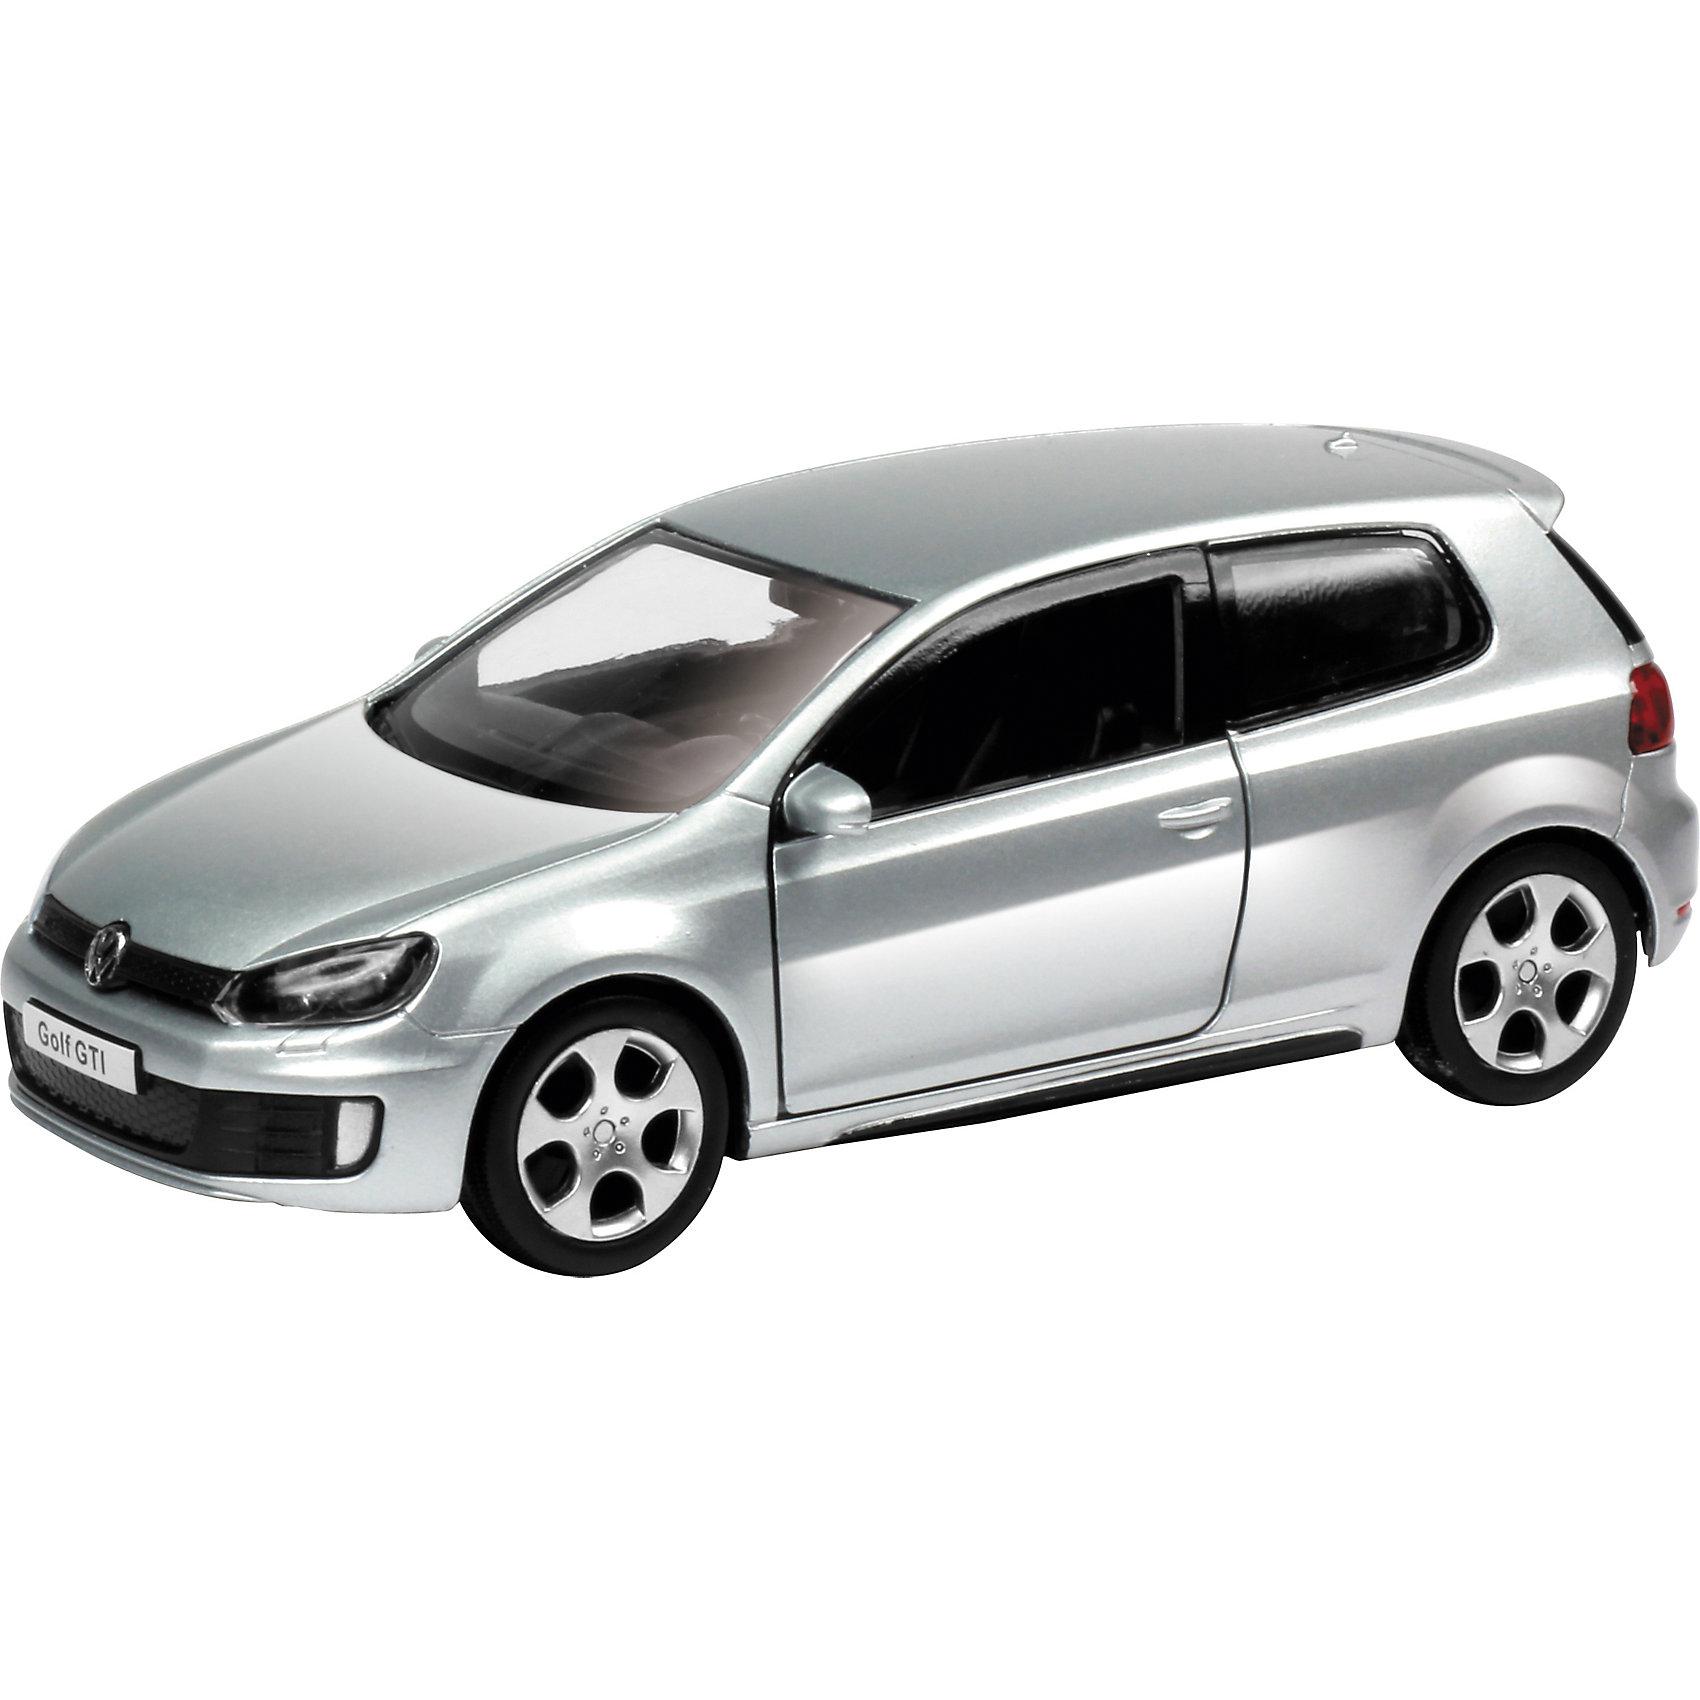 Машинка Volkswagen Golf GTI 3, AutotimeМашинки<br><br><br>Ширина мм: 90<br>Глубина мм: 42<br>Высота мм: 40<br>Вес г: 13<br>Возраст от месяцев: 36<br>Возраст до месяцев: 2147483647<br>Пол: Мужской<br>Возраст: Детский<br>SKU: 5584088